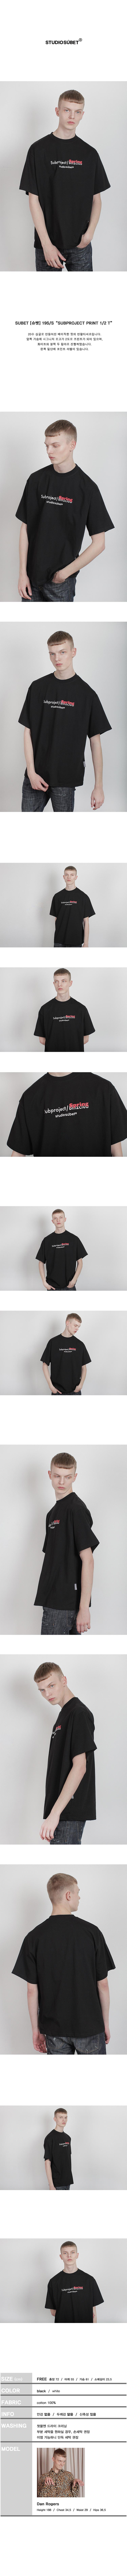 subproject print t - bk.jpg